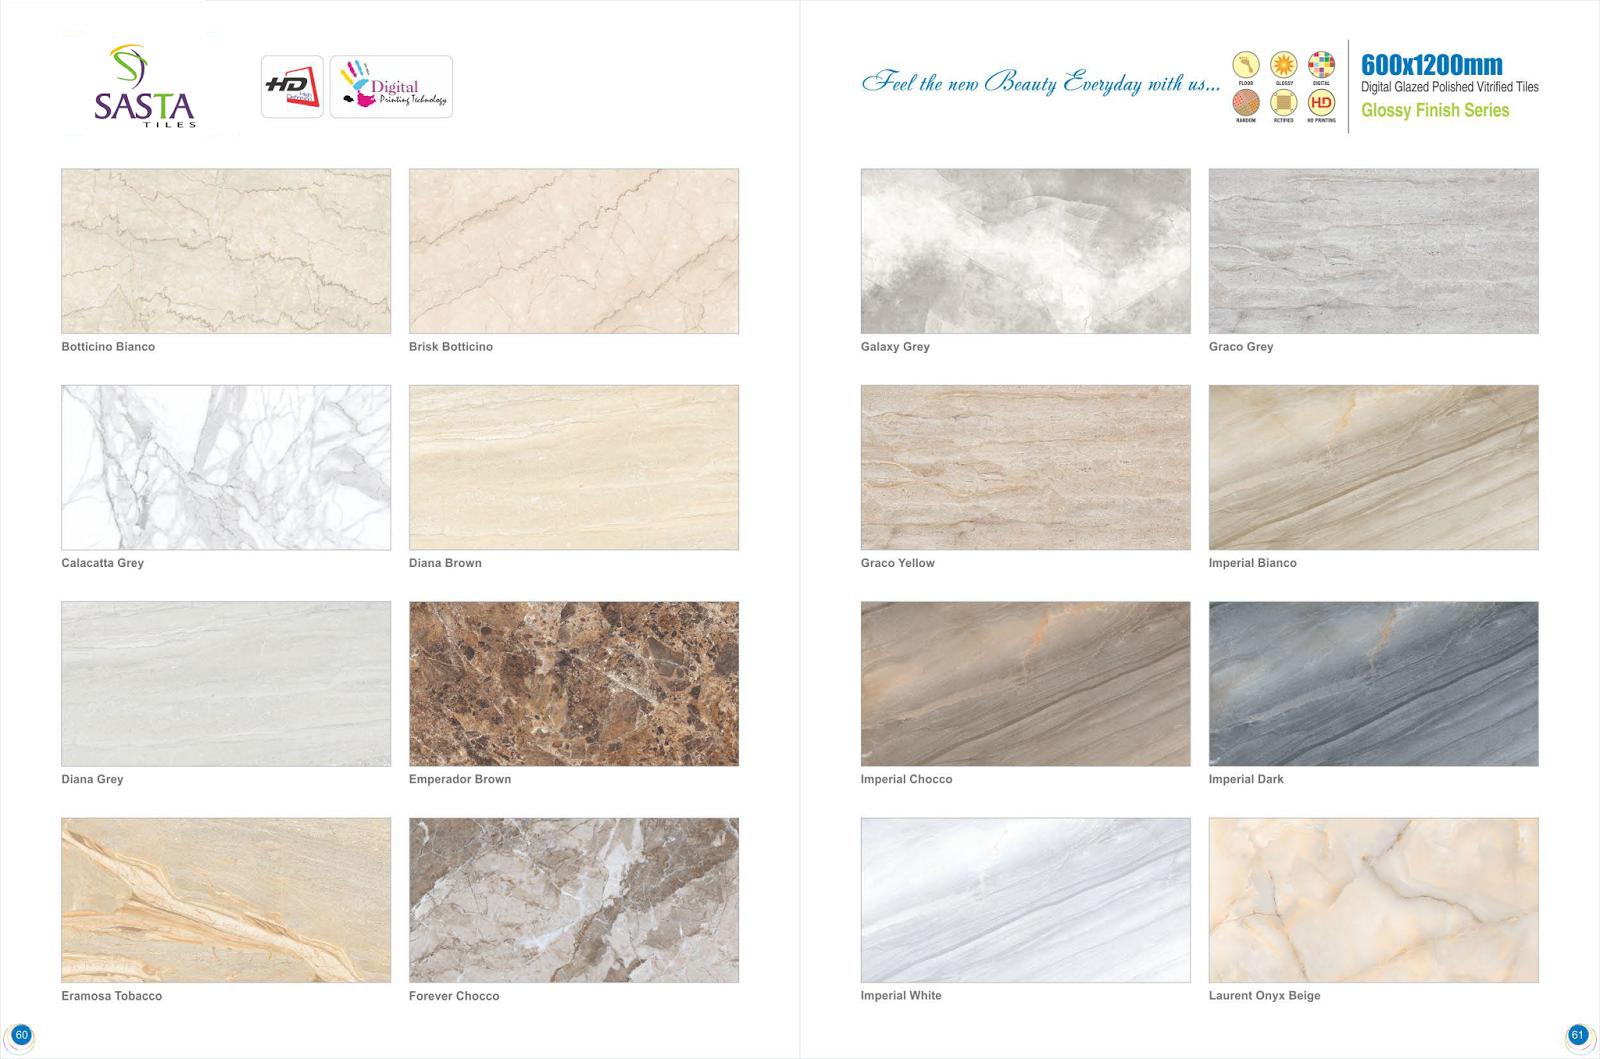 Digital glazed polished vitrified tiles 600 x 1200 mm sasta tiles - Forever tile and stone ...